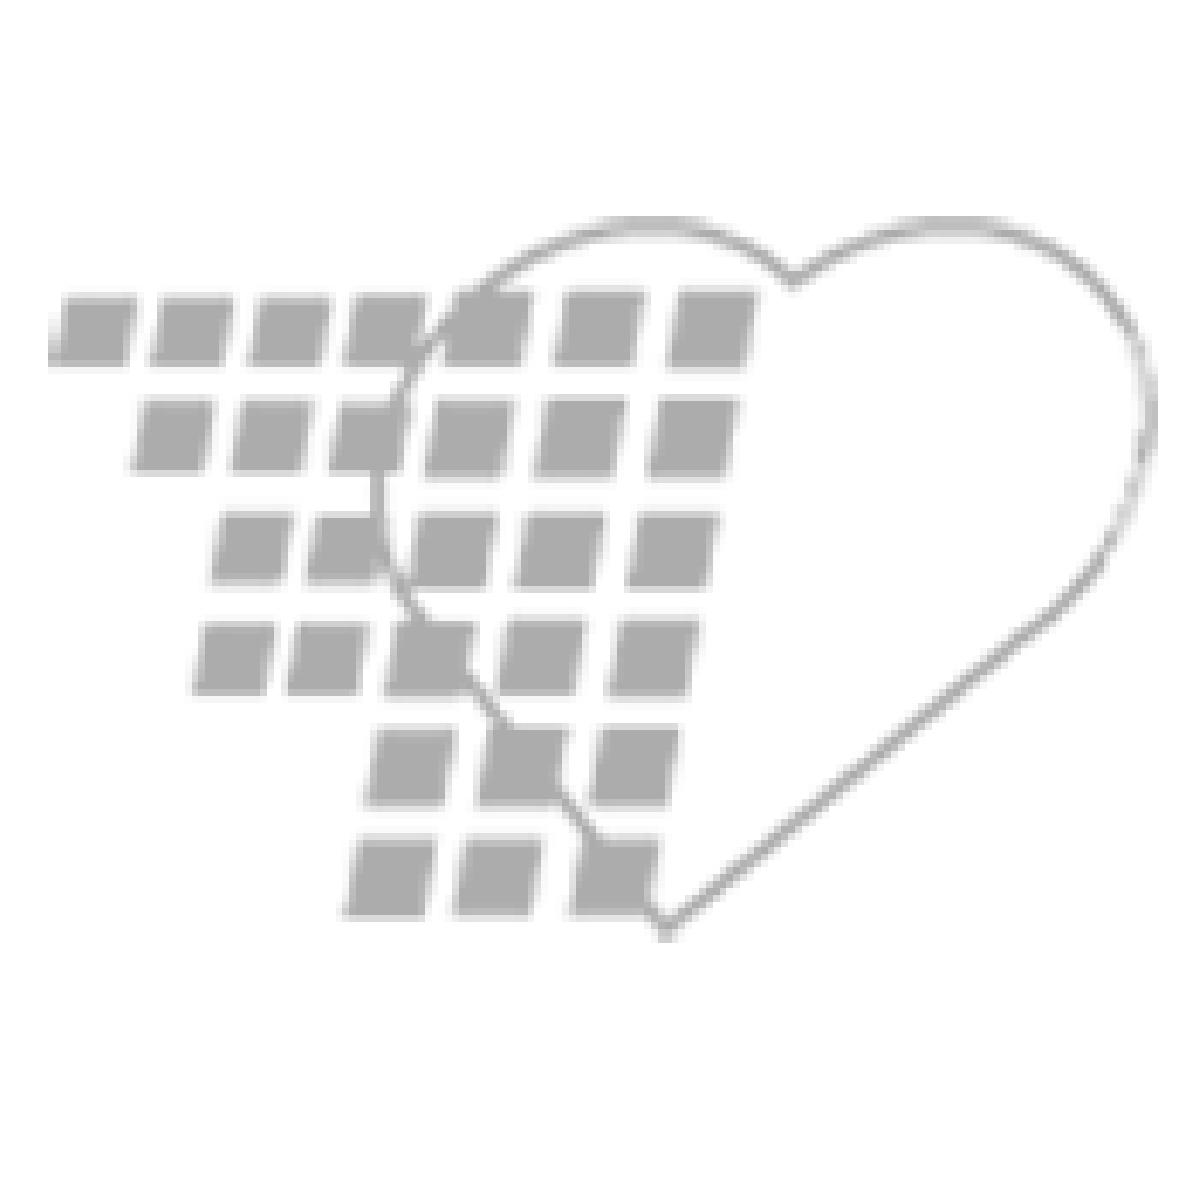 "06-82-4150 B.Braun FILTER STRAW® 5 micron Filter 1¾""Flexible Straw"